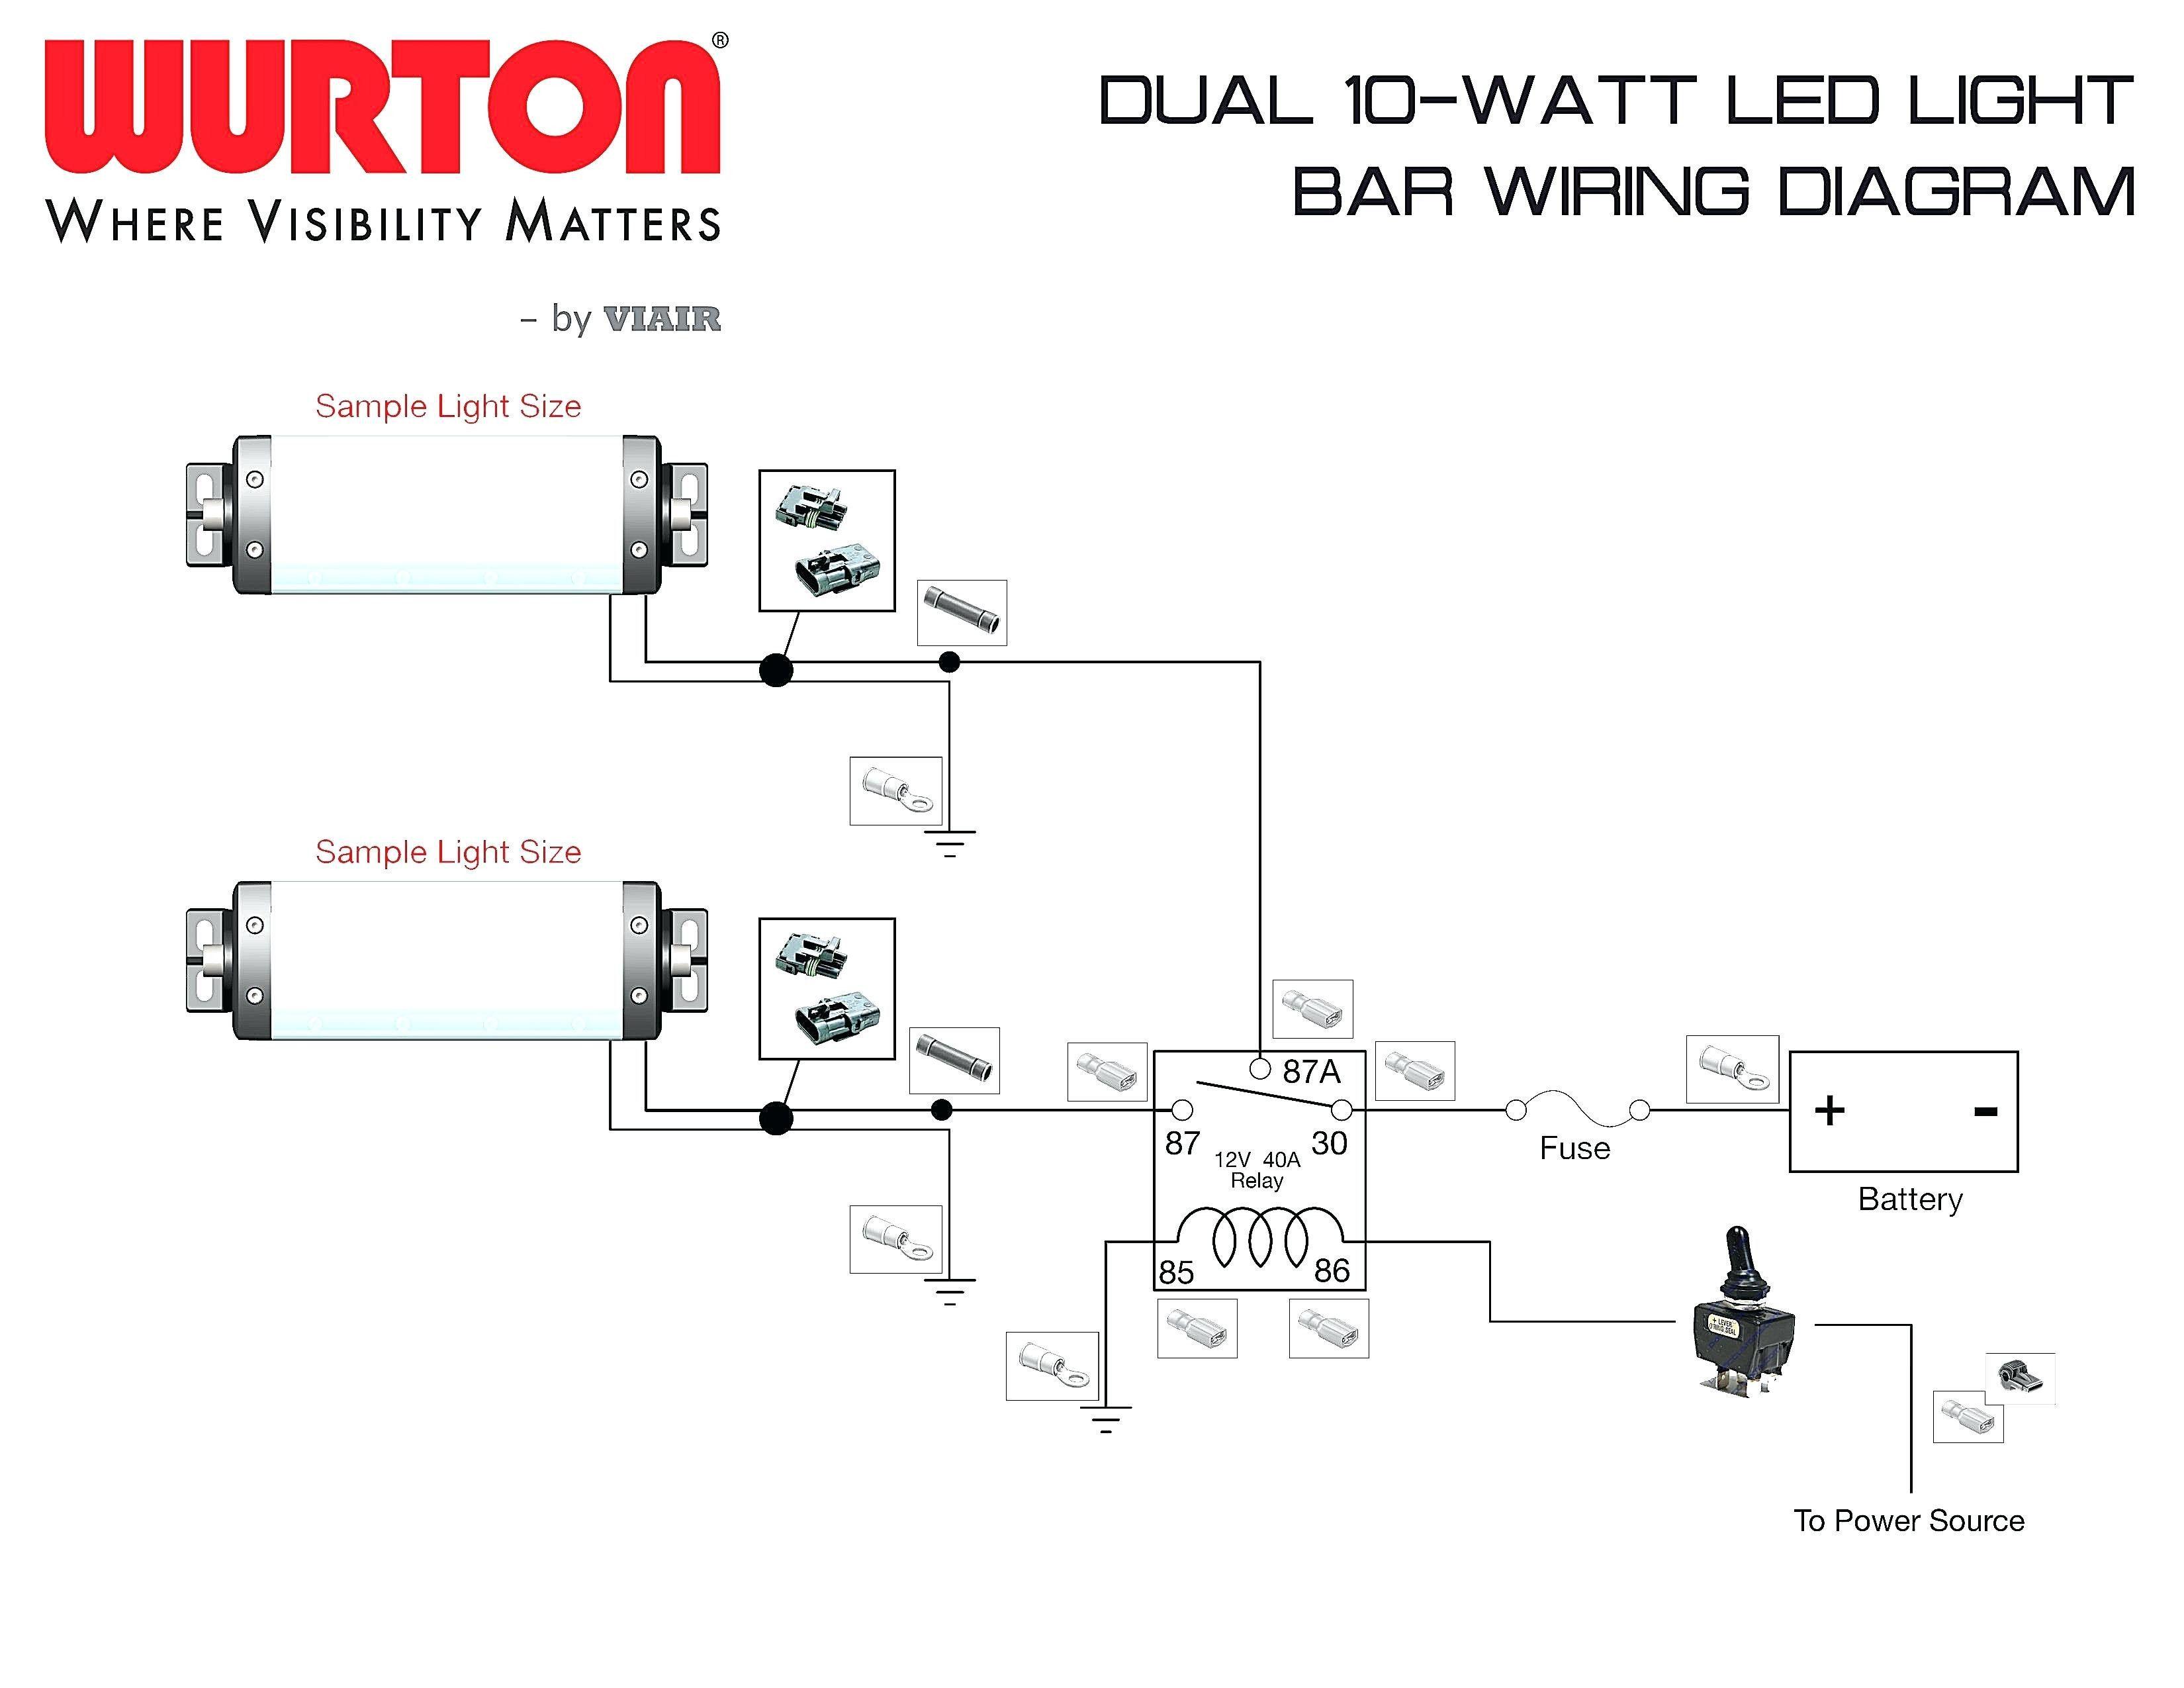 fuel sender wiring diagram wiring diagram g9 com forums 73467478f150alternatorvoltageregulatorwiringhtml [ 3300 x 2550 Pixel ]